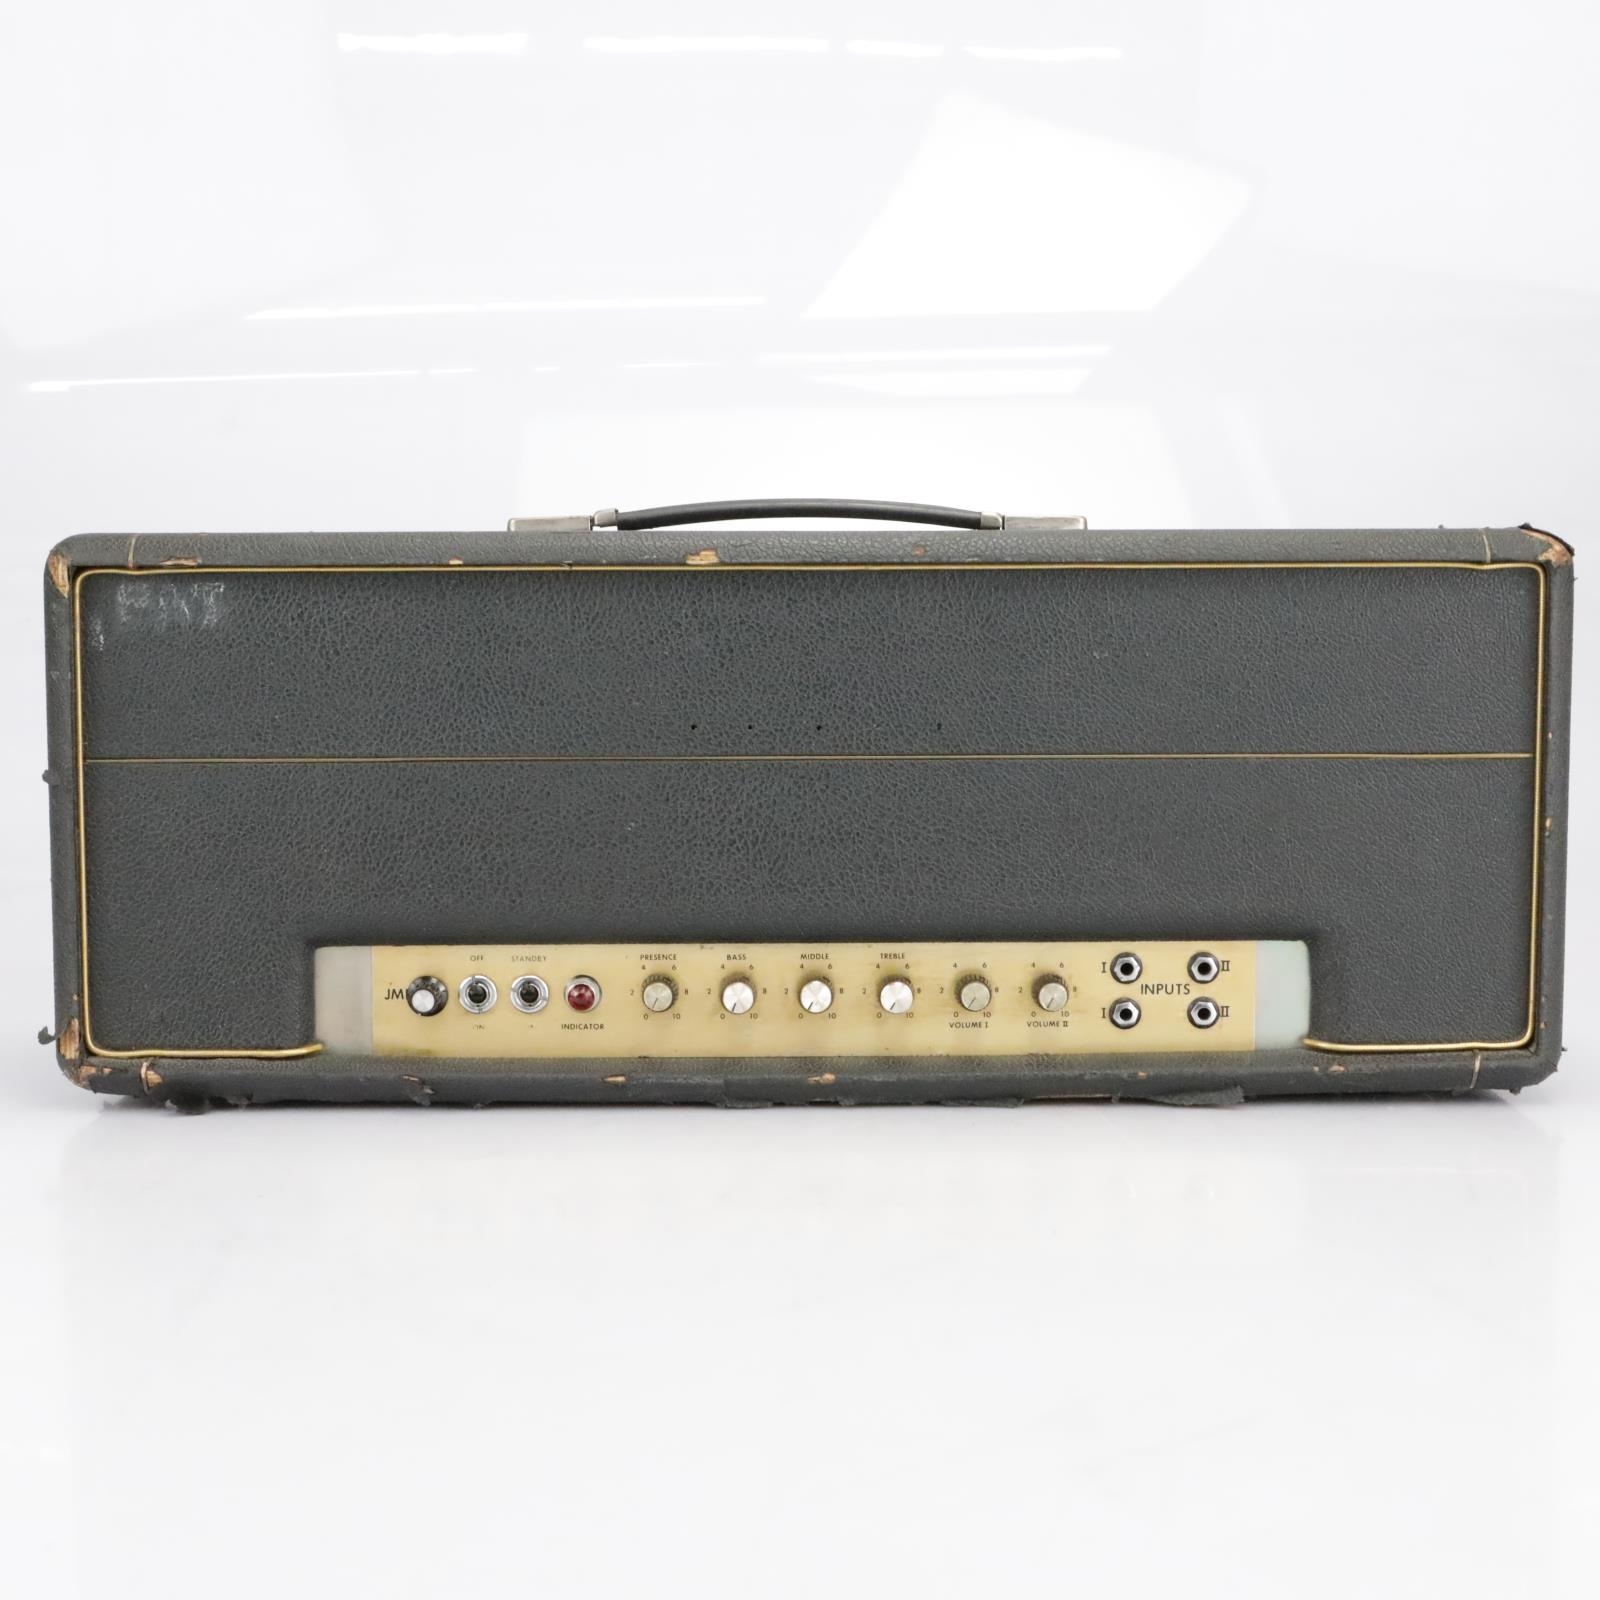 1975 Marshall Super Lead 100w MKII Guitar Tube Amp Head #40783